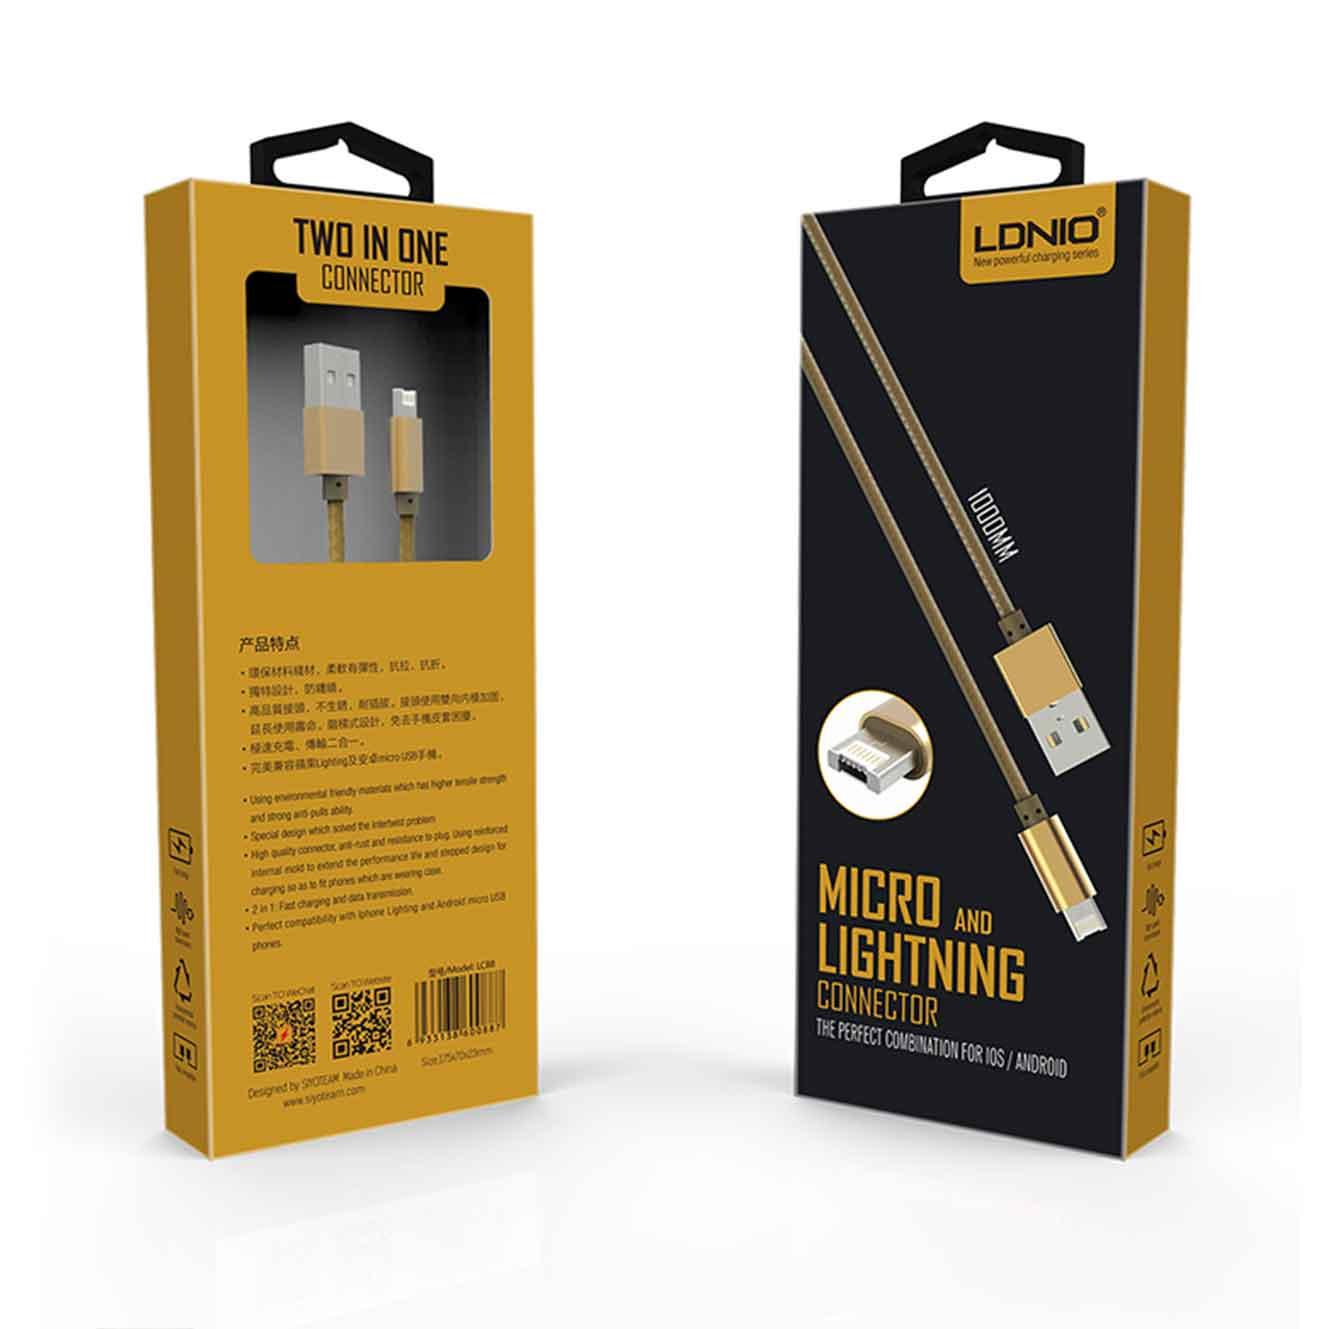 Кабел за данни, LDNIO, 2 в 1, Micro USB + Lightning (iPhone 5/6/7), С оплетка, Златист - 14490